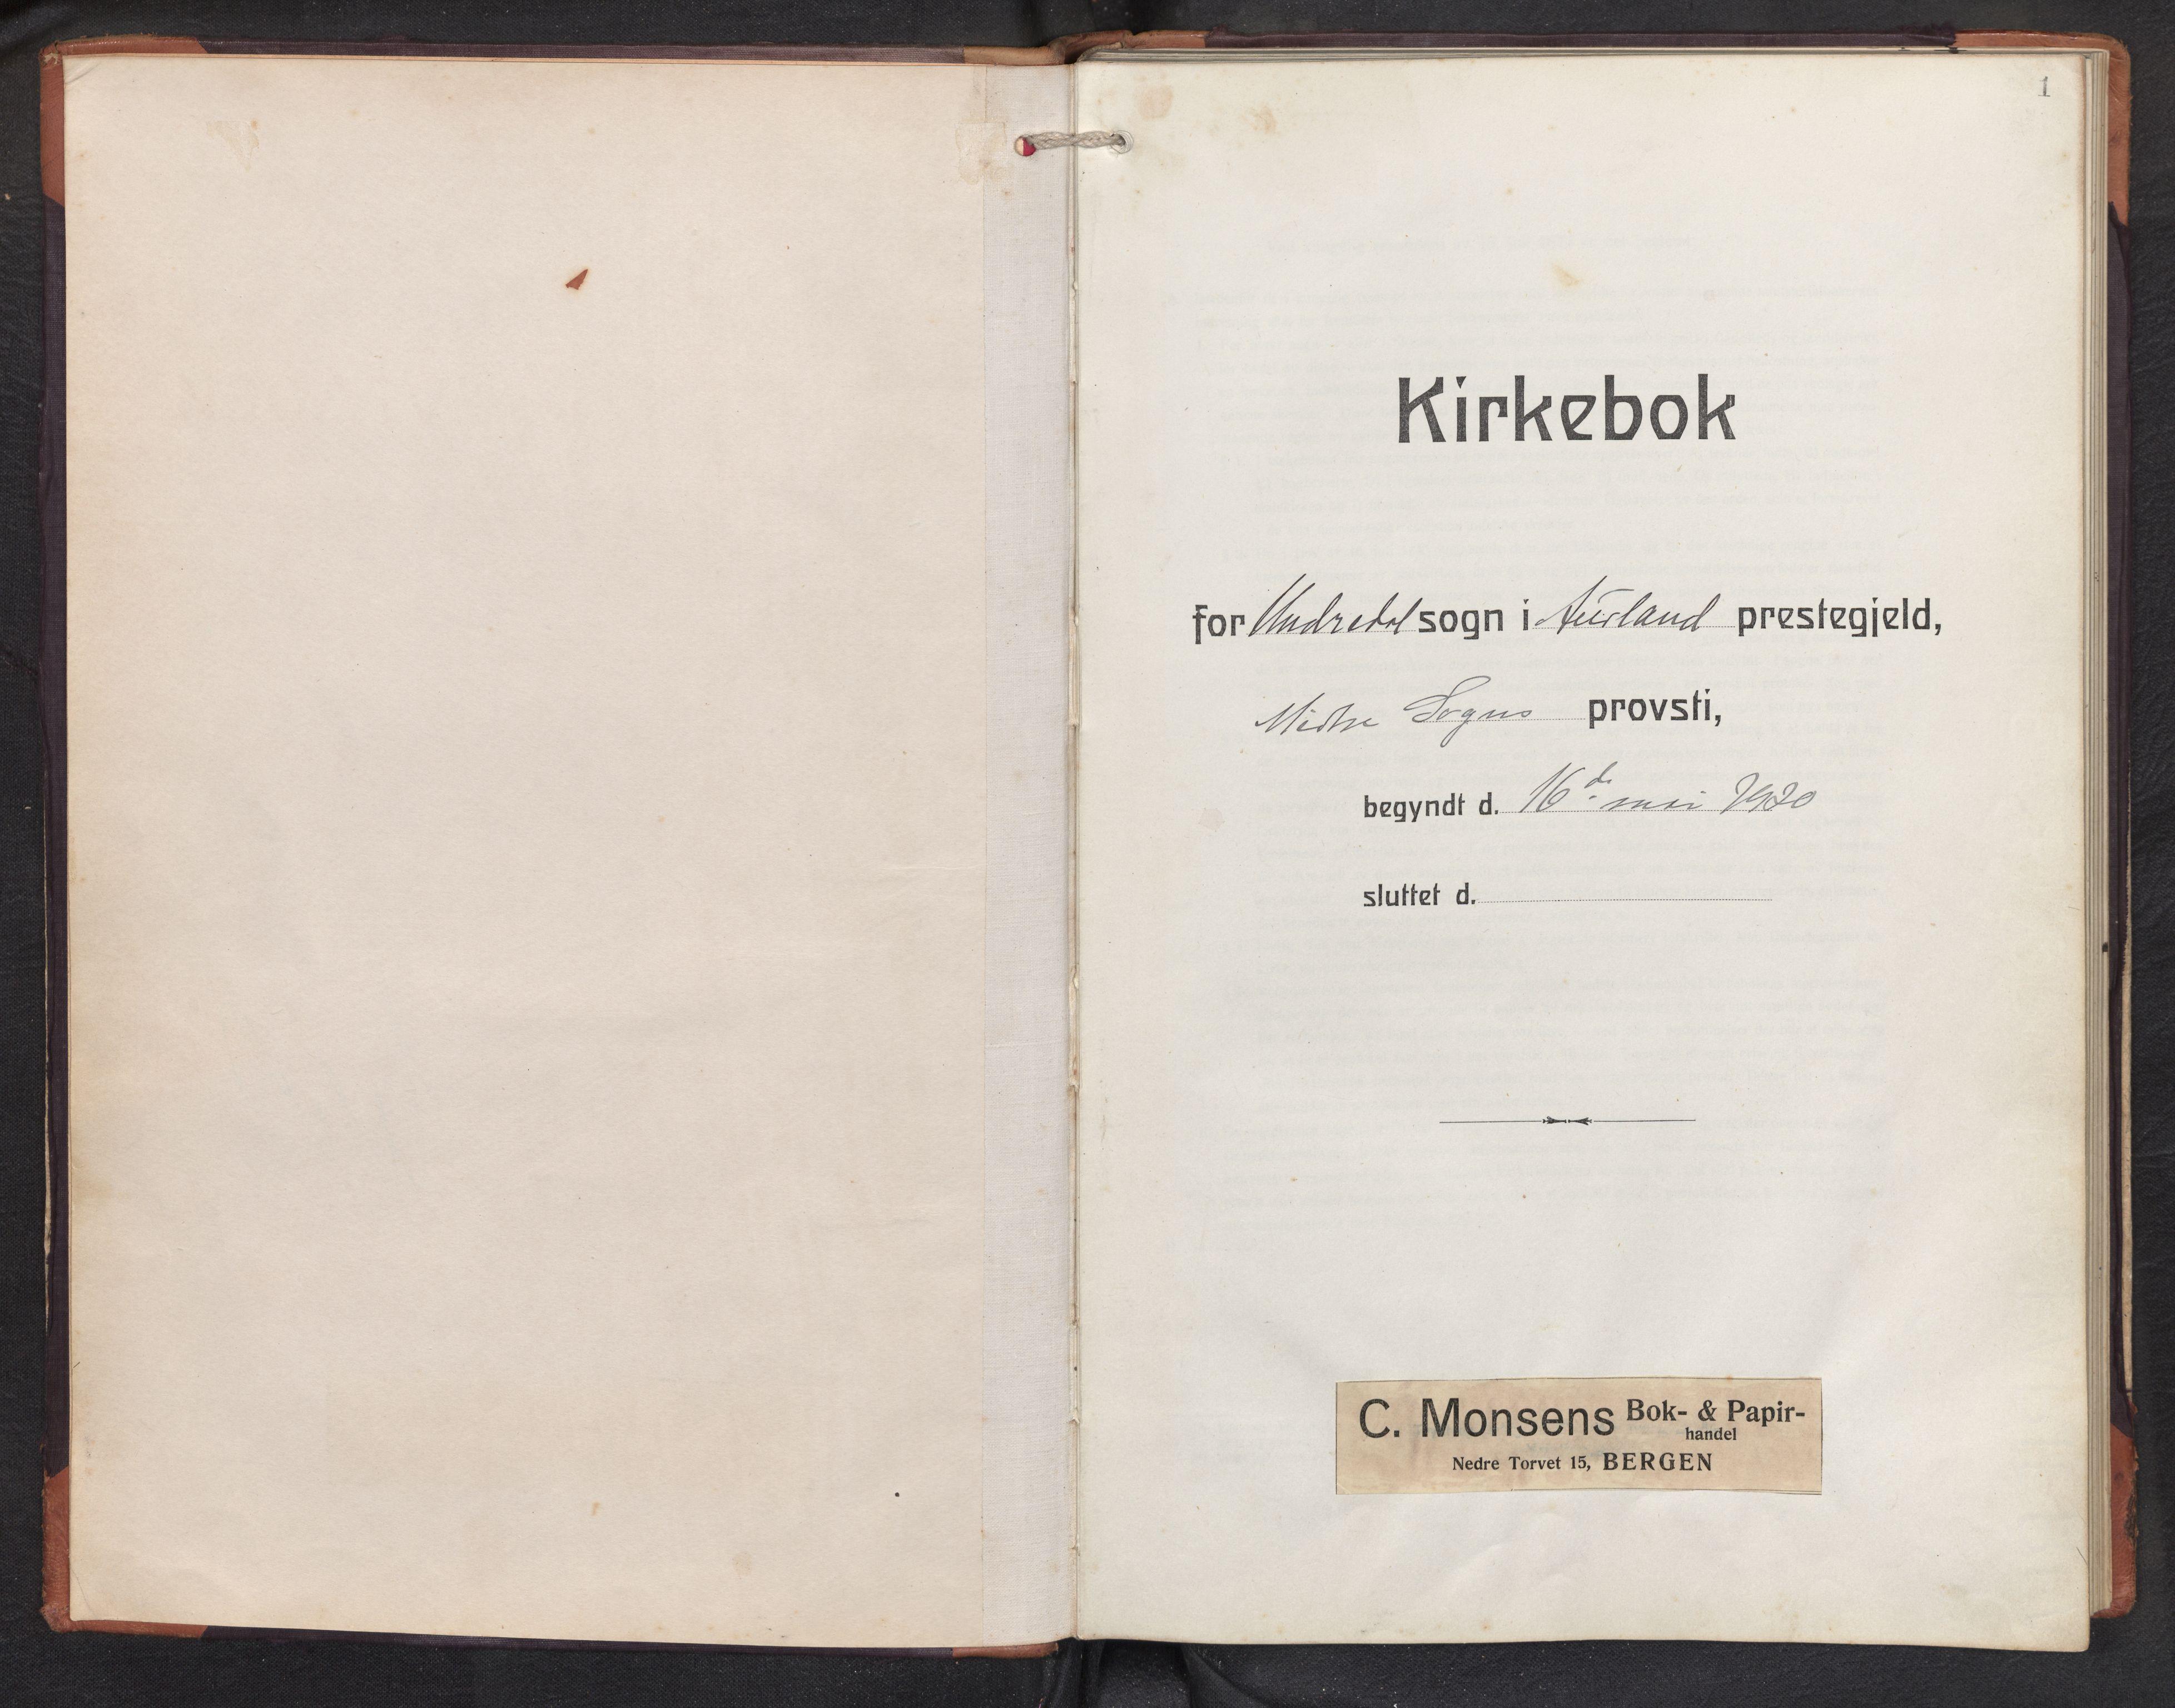 SAB, Aurland Sokneprestembete*, Klokkerbok nr. D 3, 1920-1968, s. 0b-1a